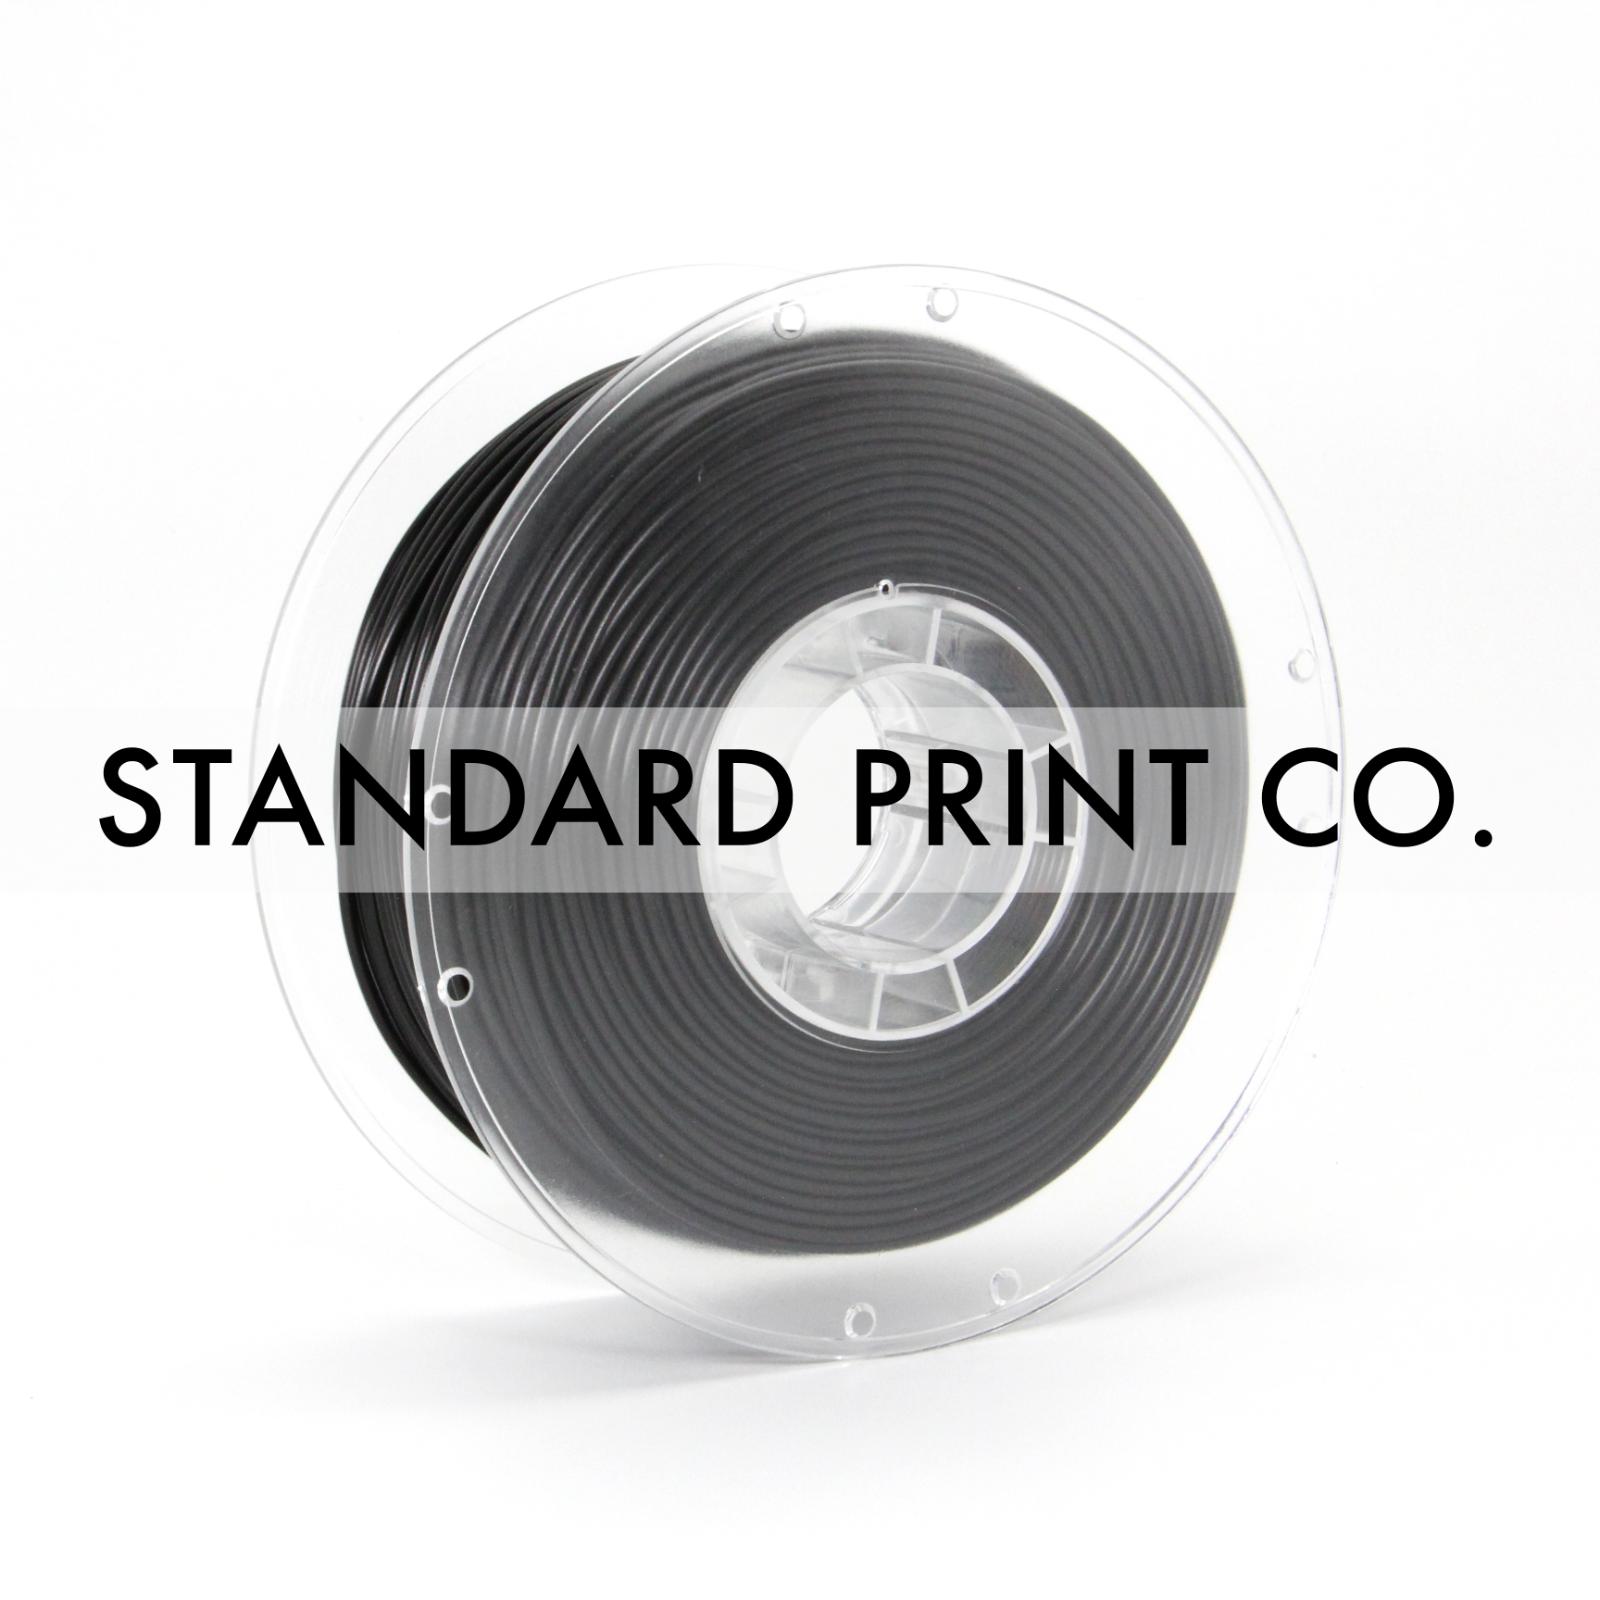 3D Printer Filament PETG 2.85mm 1KG Australian Stock Standard Print Co.